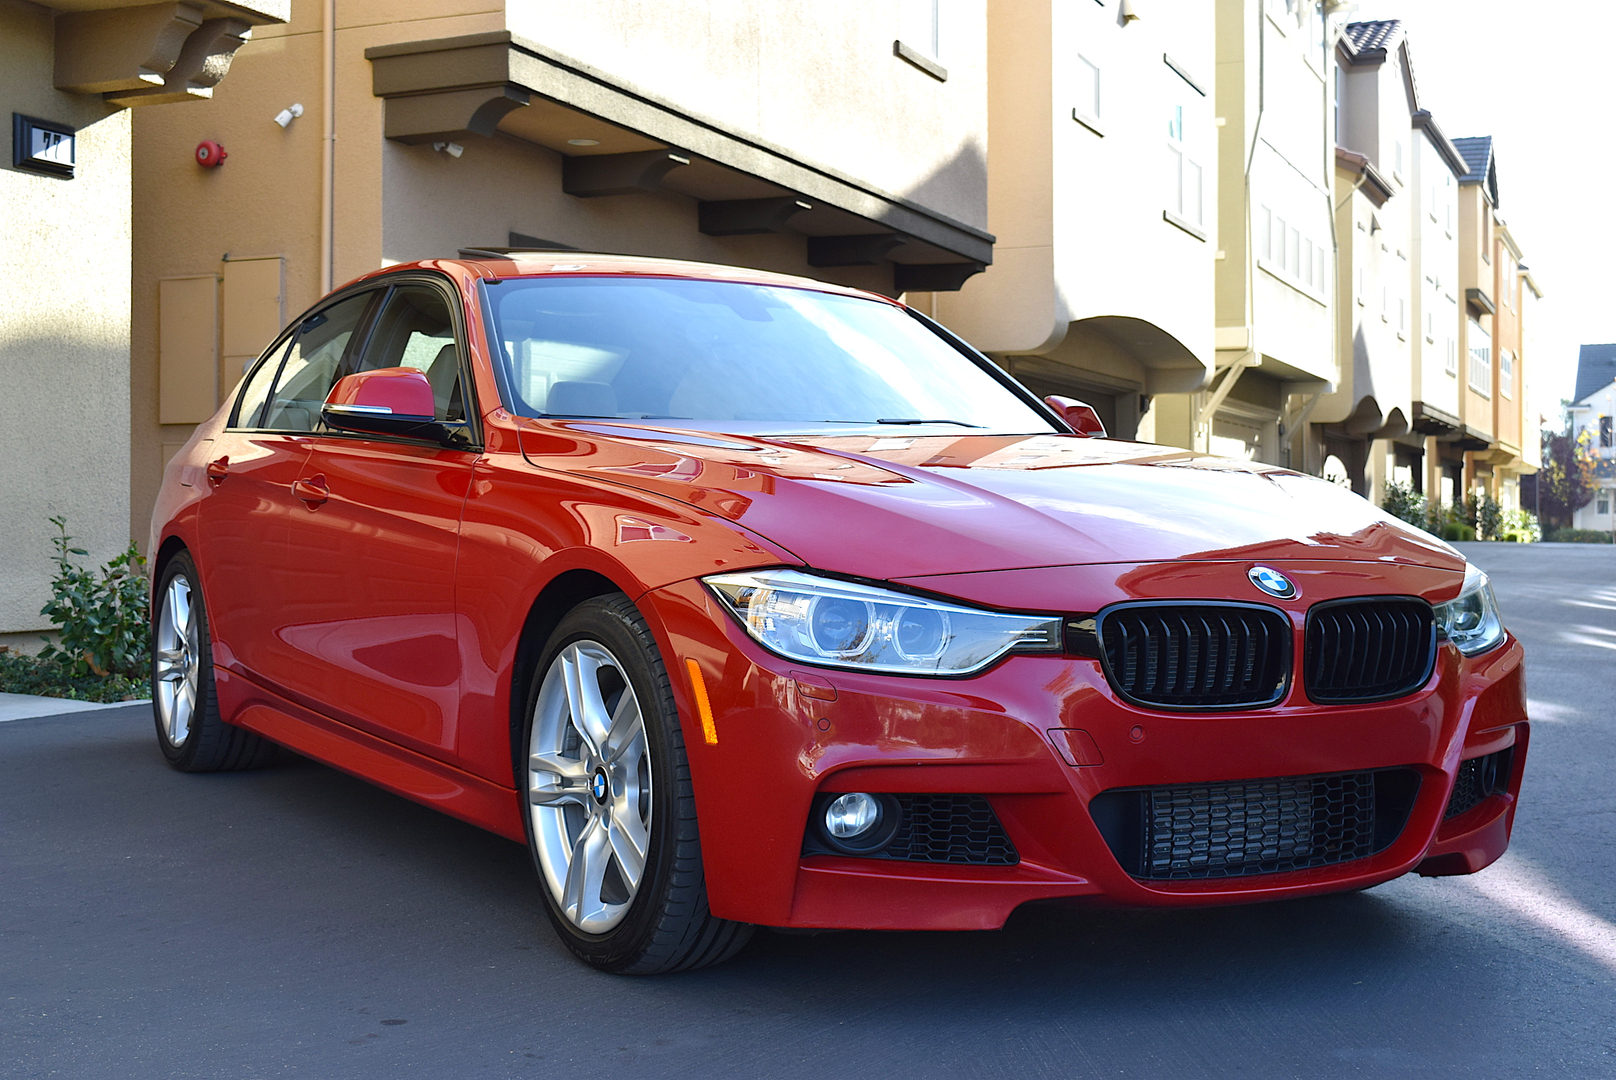 BMW I M Sport K Miles Melbourne RedBeige - Bmw 328i red